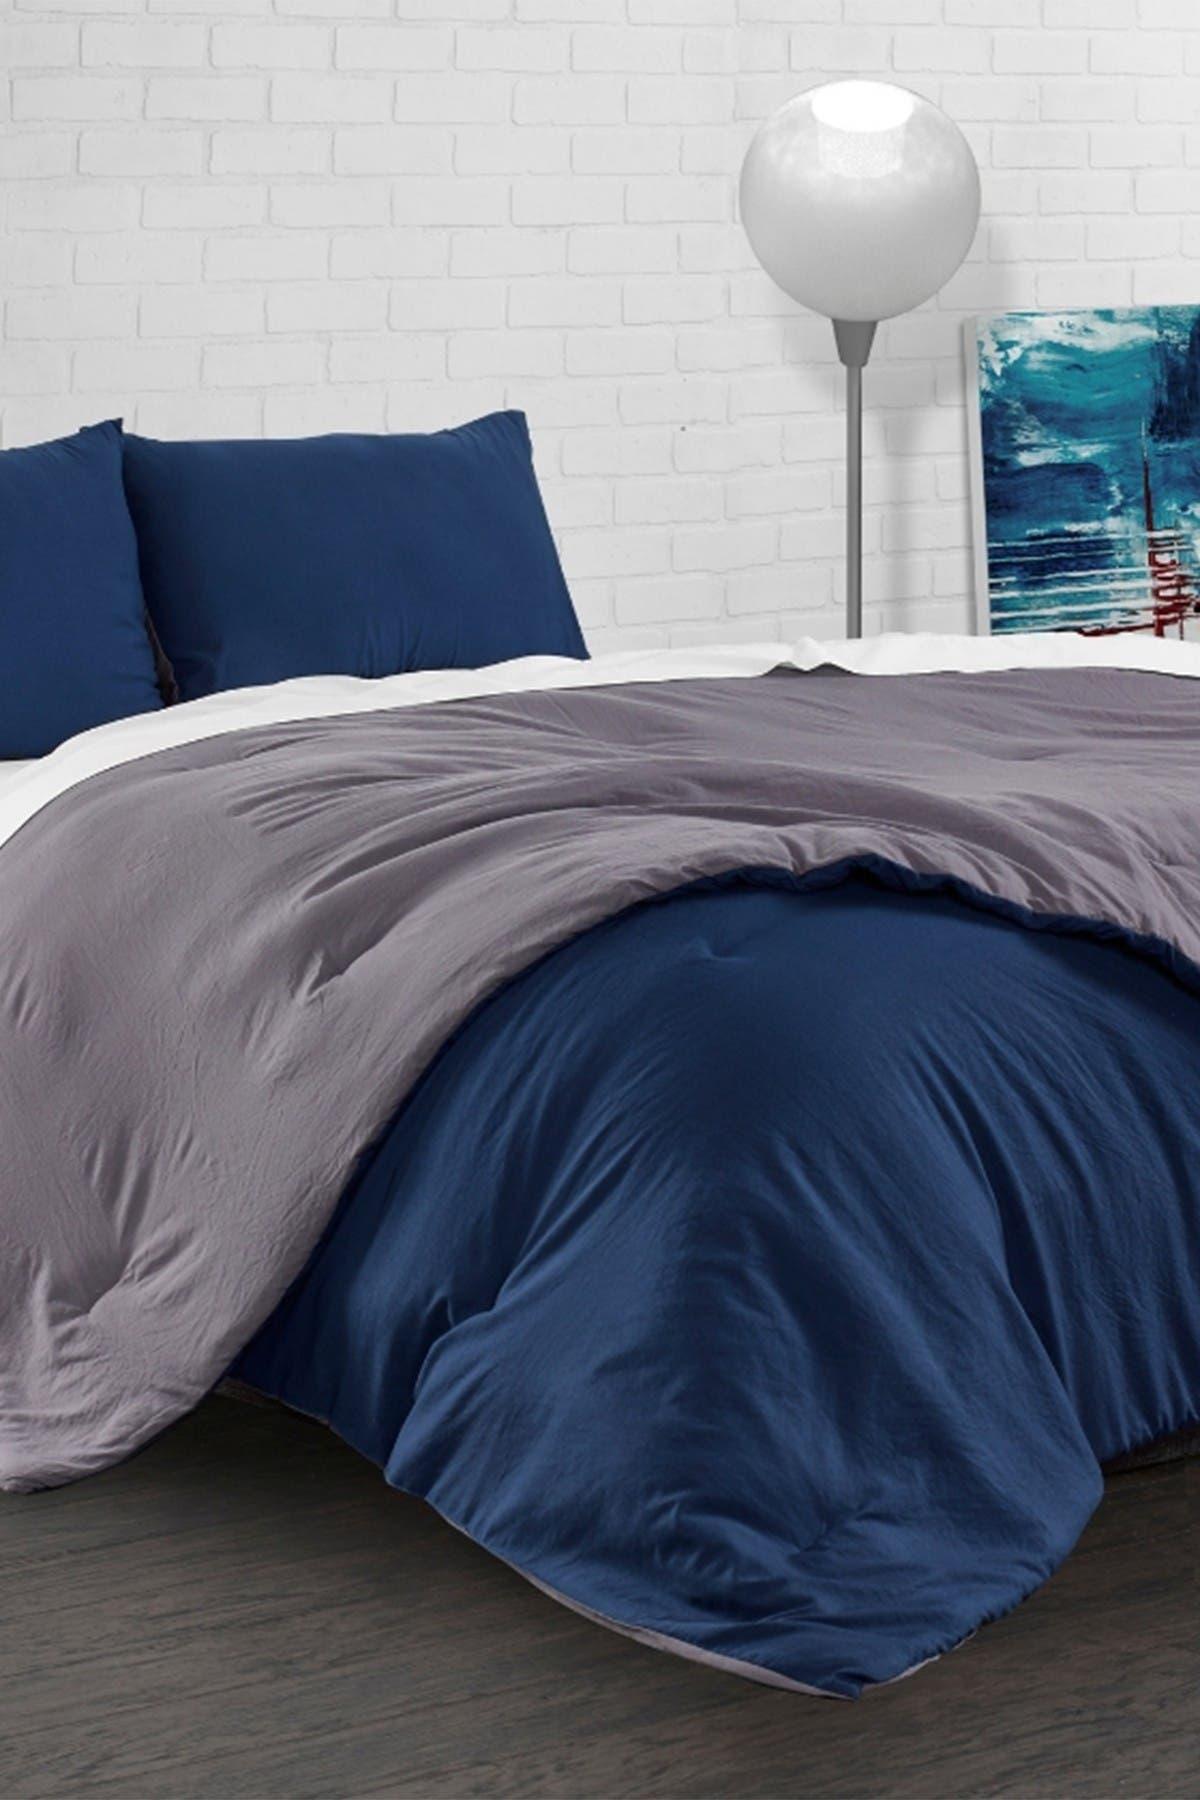 Image of Ella Jayne Reversible Brushed Microfiber Plush Down-Alt Comforter 3 Piece Set - King - Charcoal/Navy